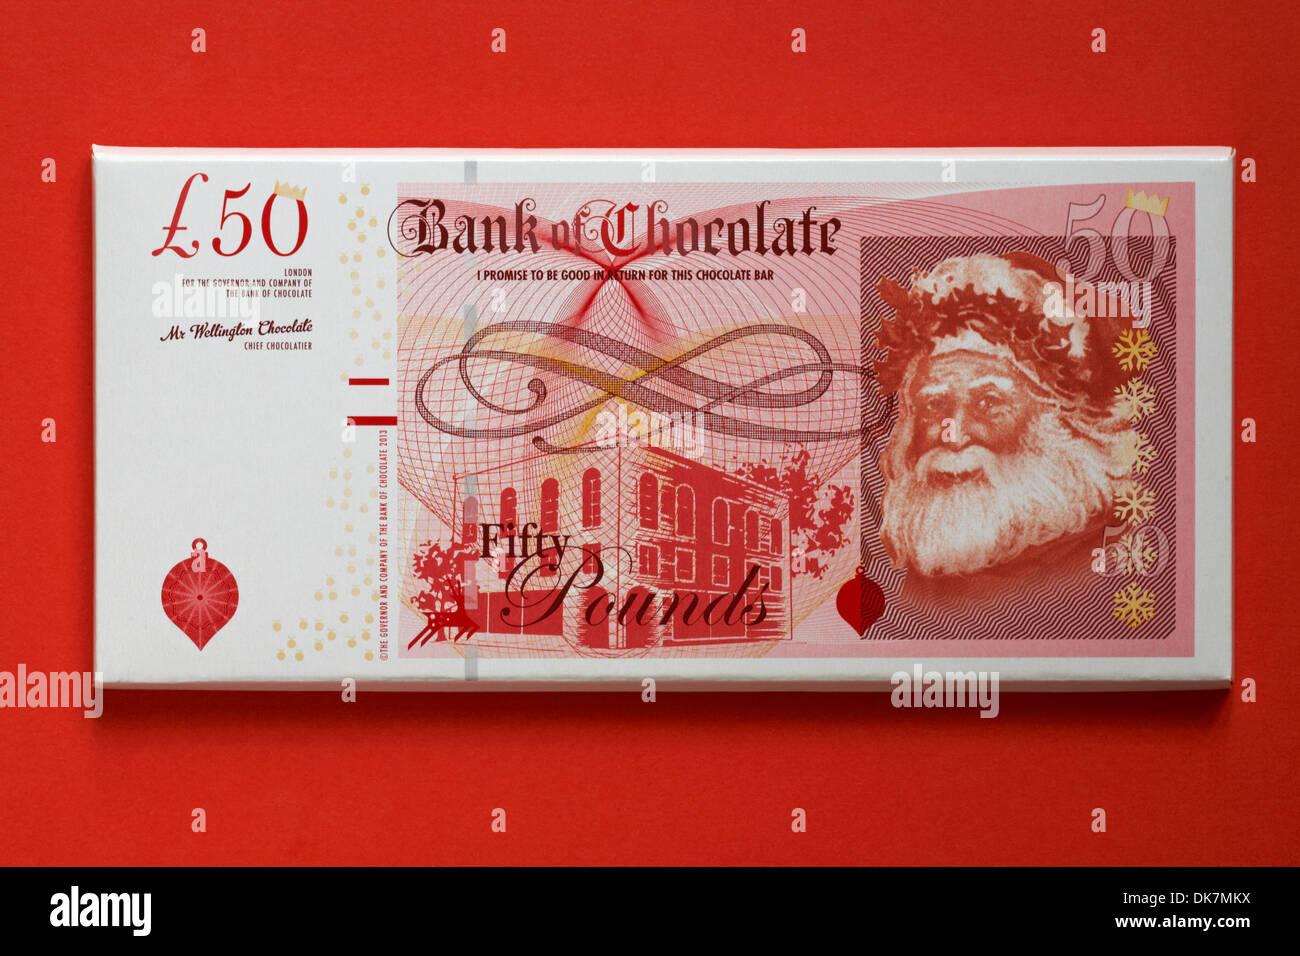 Eetbank En Tafel : Föhr amrumer bank spendet an tafel und jugendzentren shz